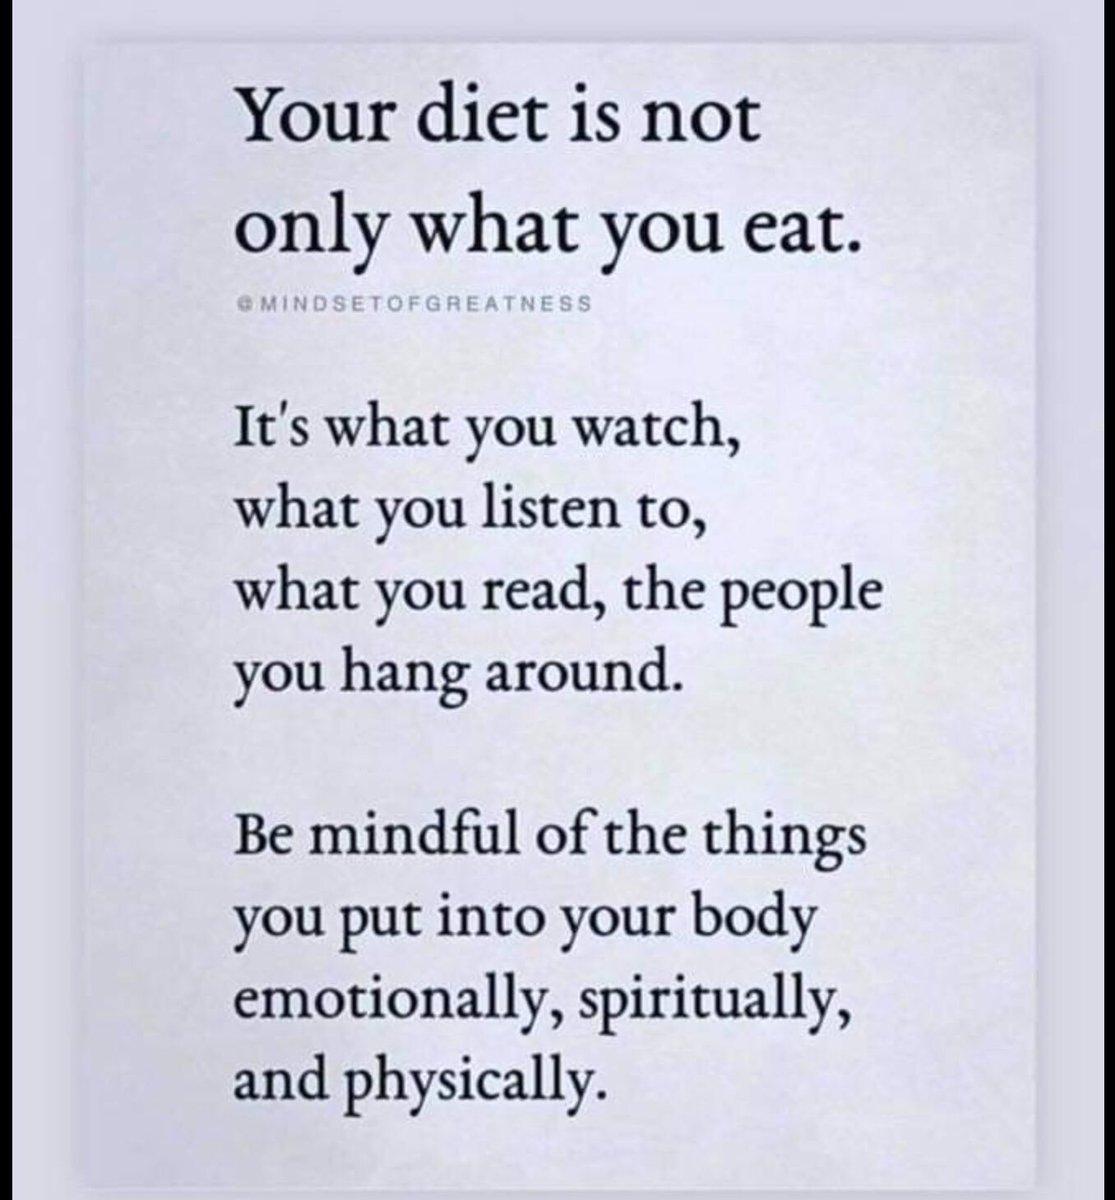 It's not a Diet, It's a LIFESTYLE! #SundayMotivation #Change #mindful #Success #Greatness #Fitness #FitLife #Goals #NewYearNewYou #TradingTimeForMoney #Motivation #Goals #Dream